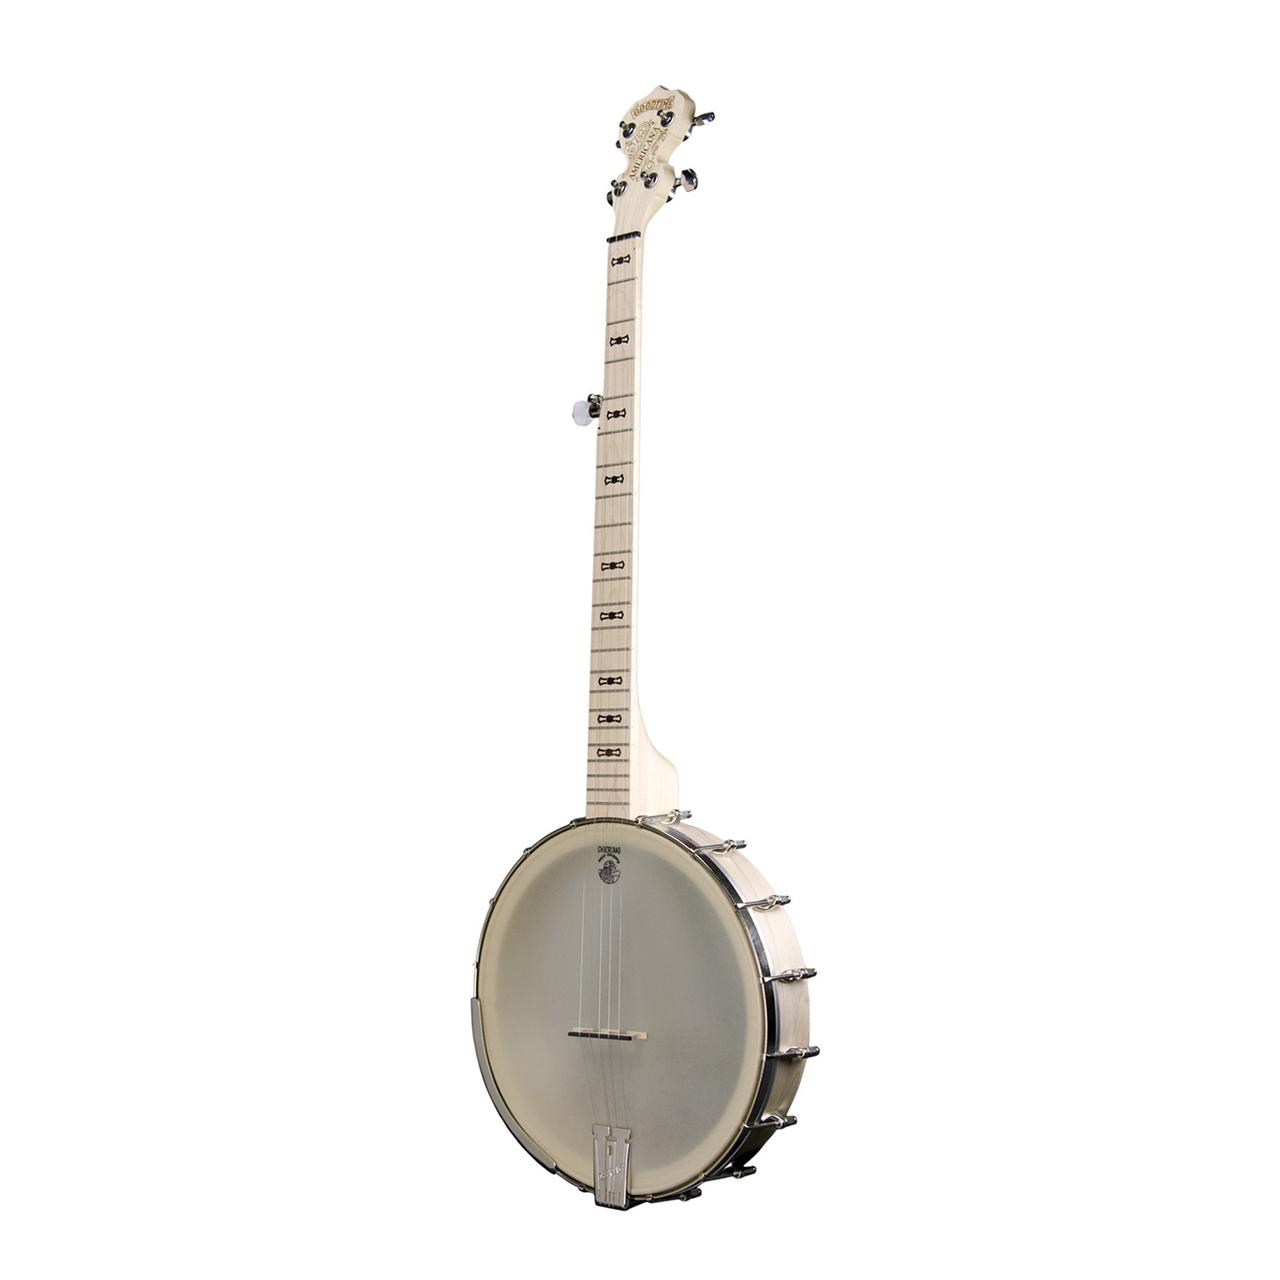 "Goodtime Americana Front  01866.1449795652.1280.1280 - Deering Goodtime Americana 12"" Pot Openback Banjo"